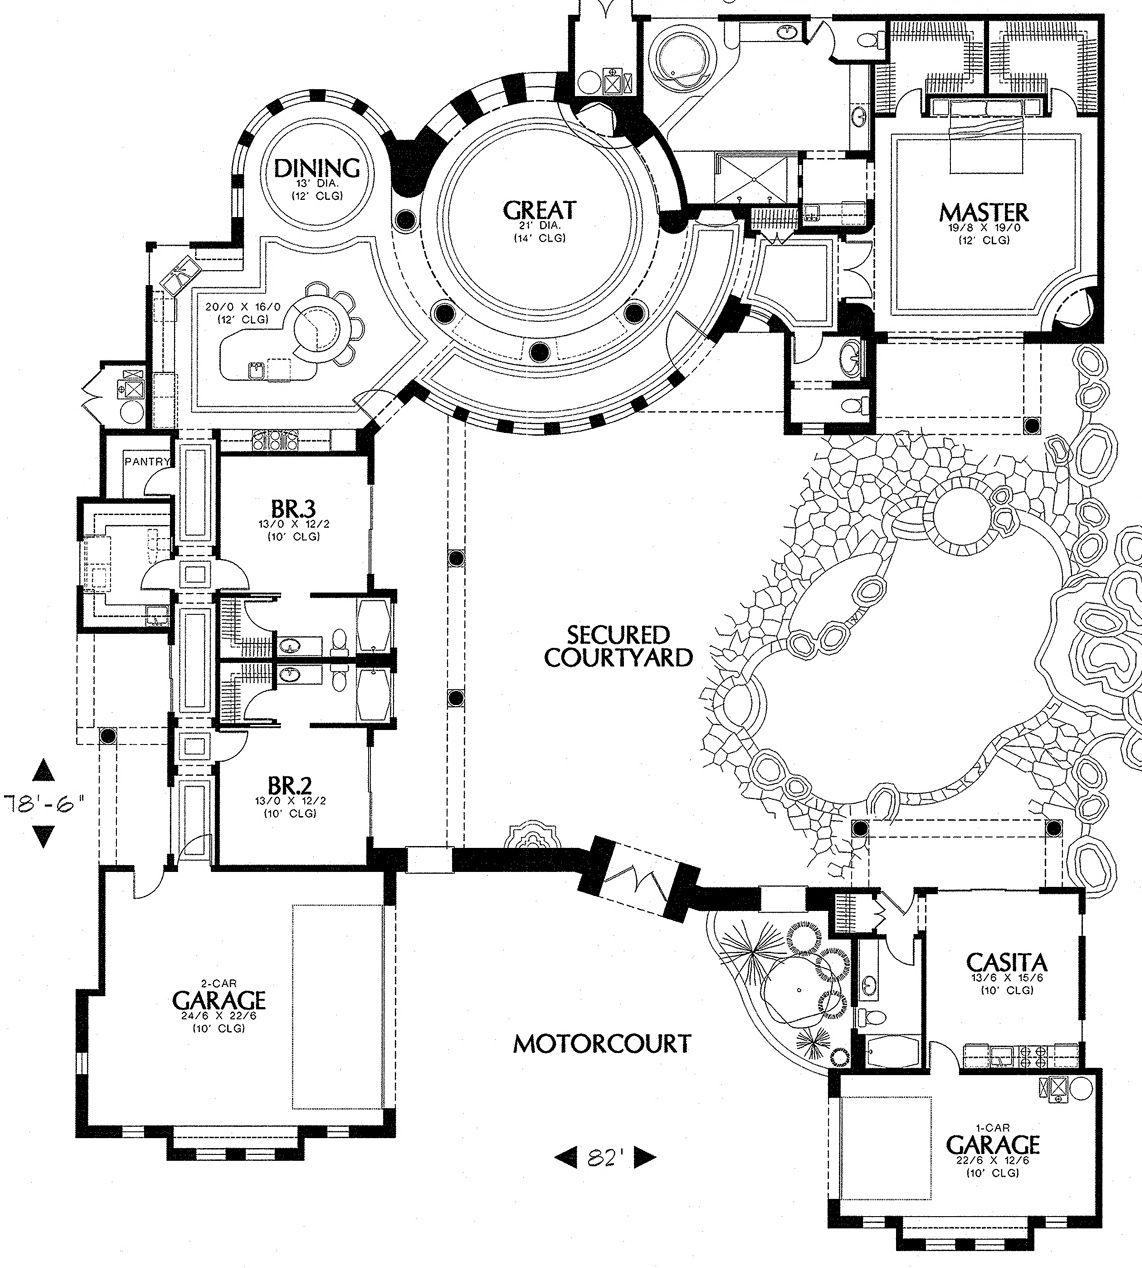 Luxury Mediterranean Style House Plan 1250 Mediterranean Style House Plans Pool House Plans Courtyard House Plans